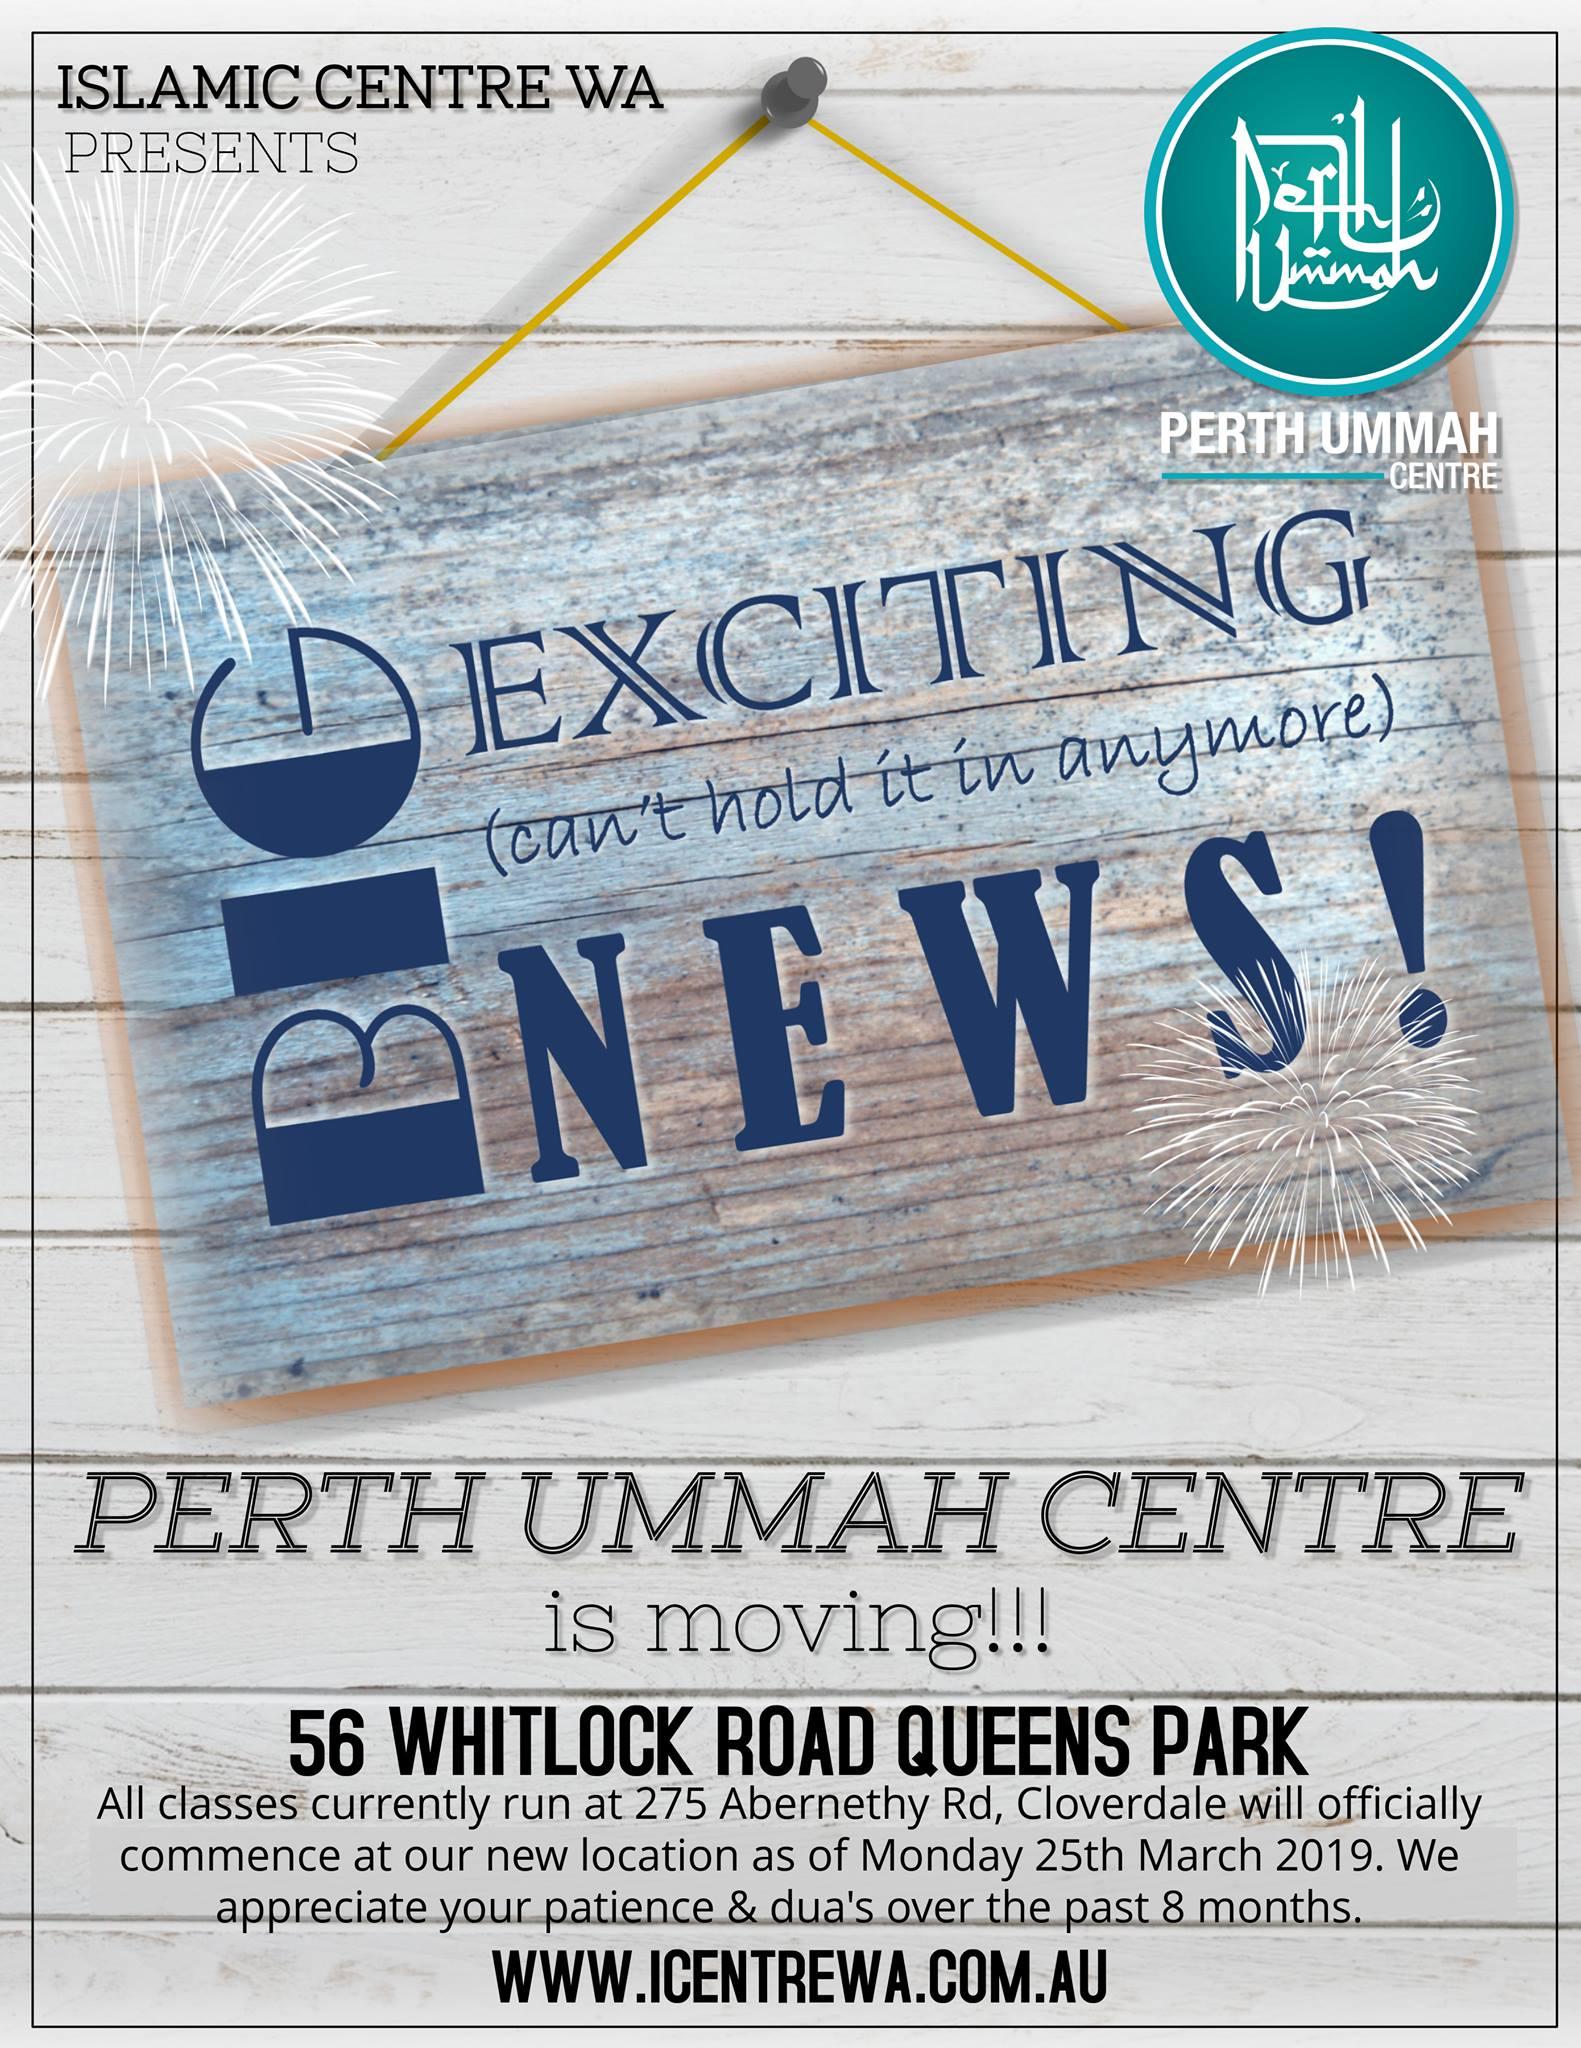 Perth Ummah Centre Relocation – The Islamic Centre of